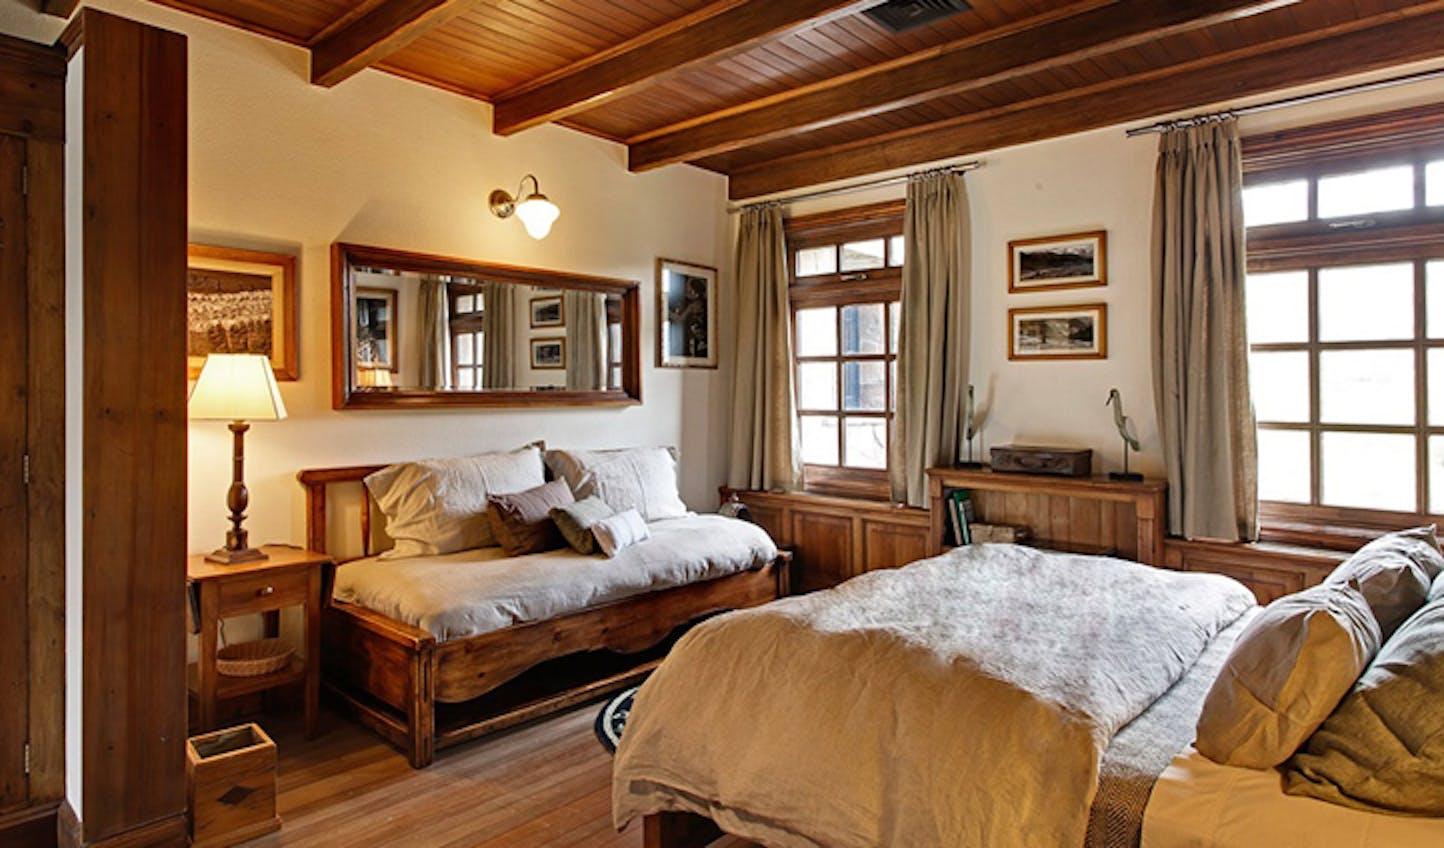 A bedroom at the Estancia Lodge, Chile